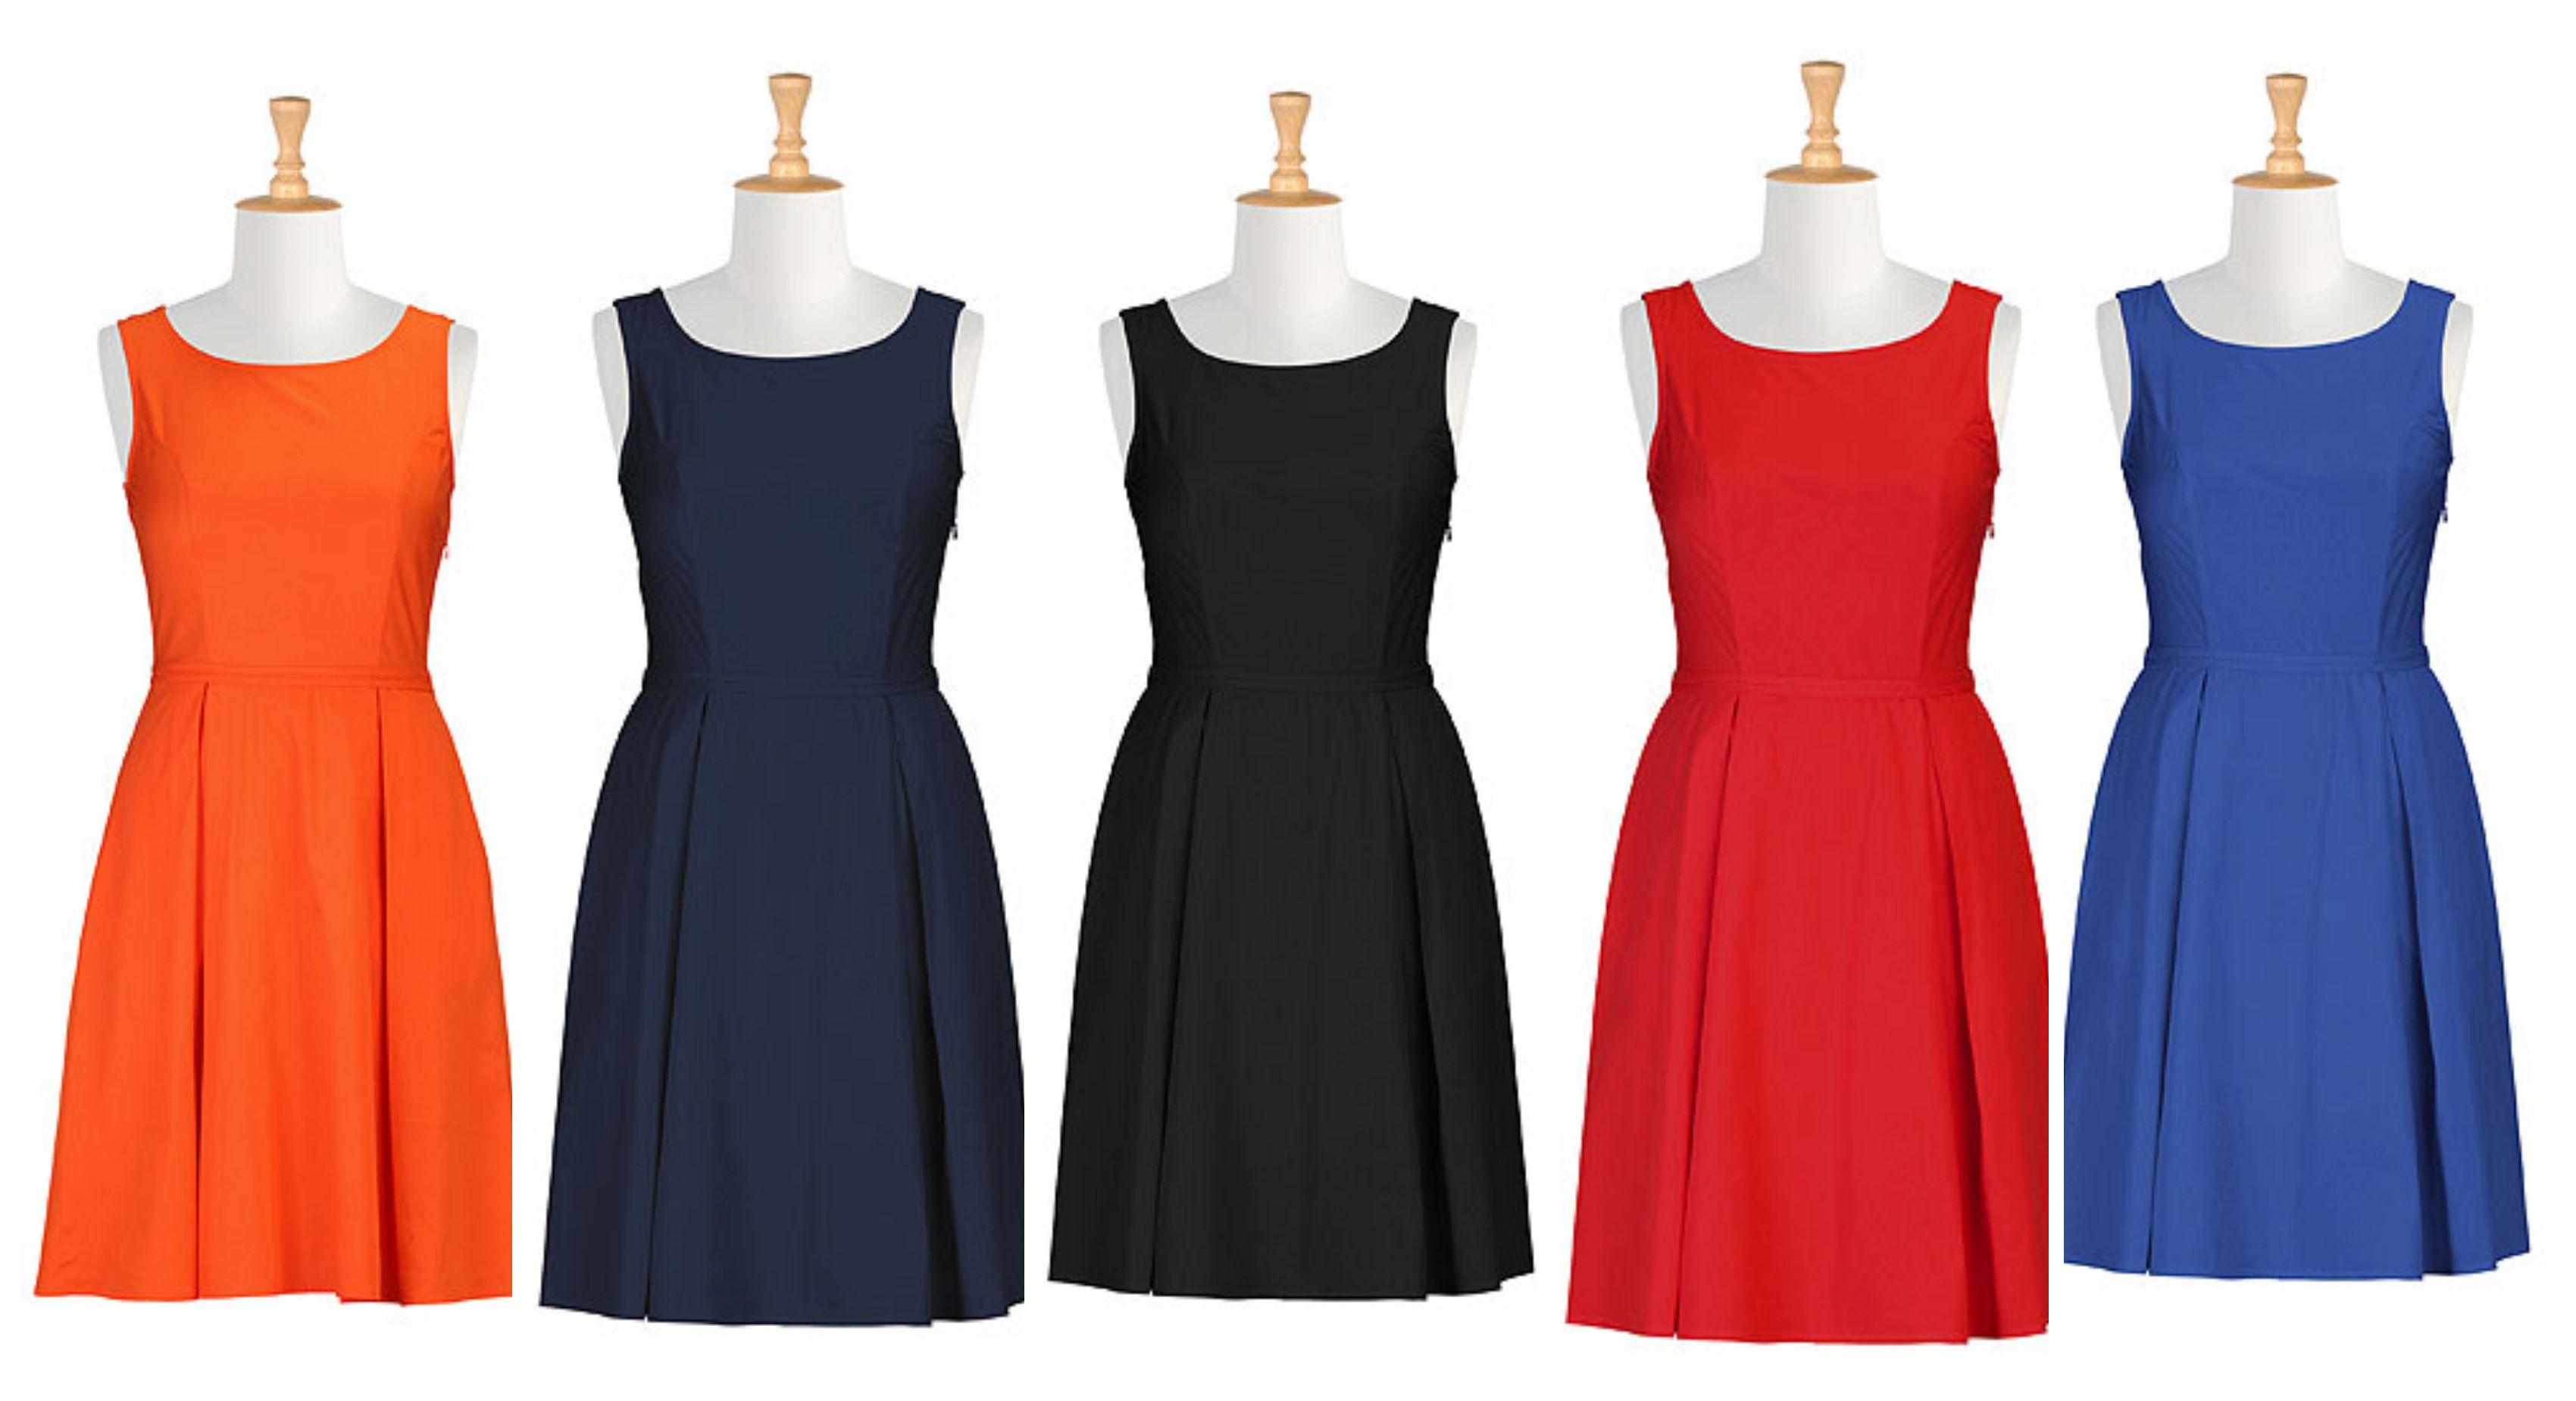 mismatched bridesmaid dresses rustic